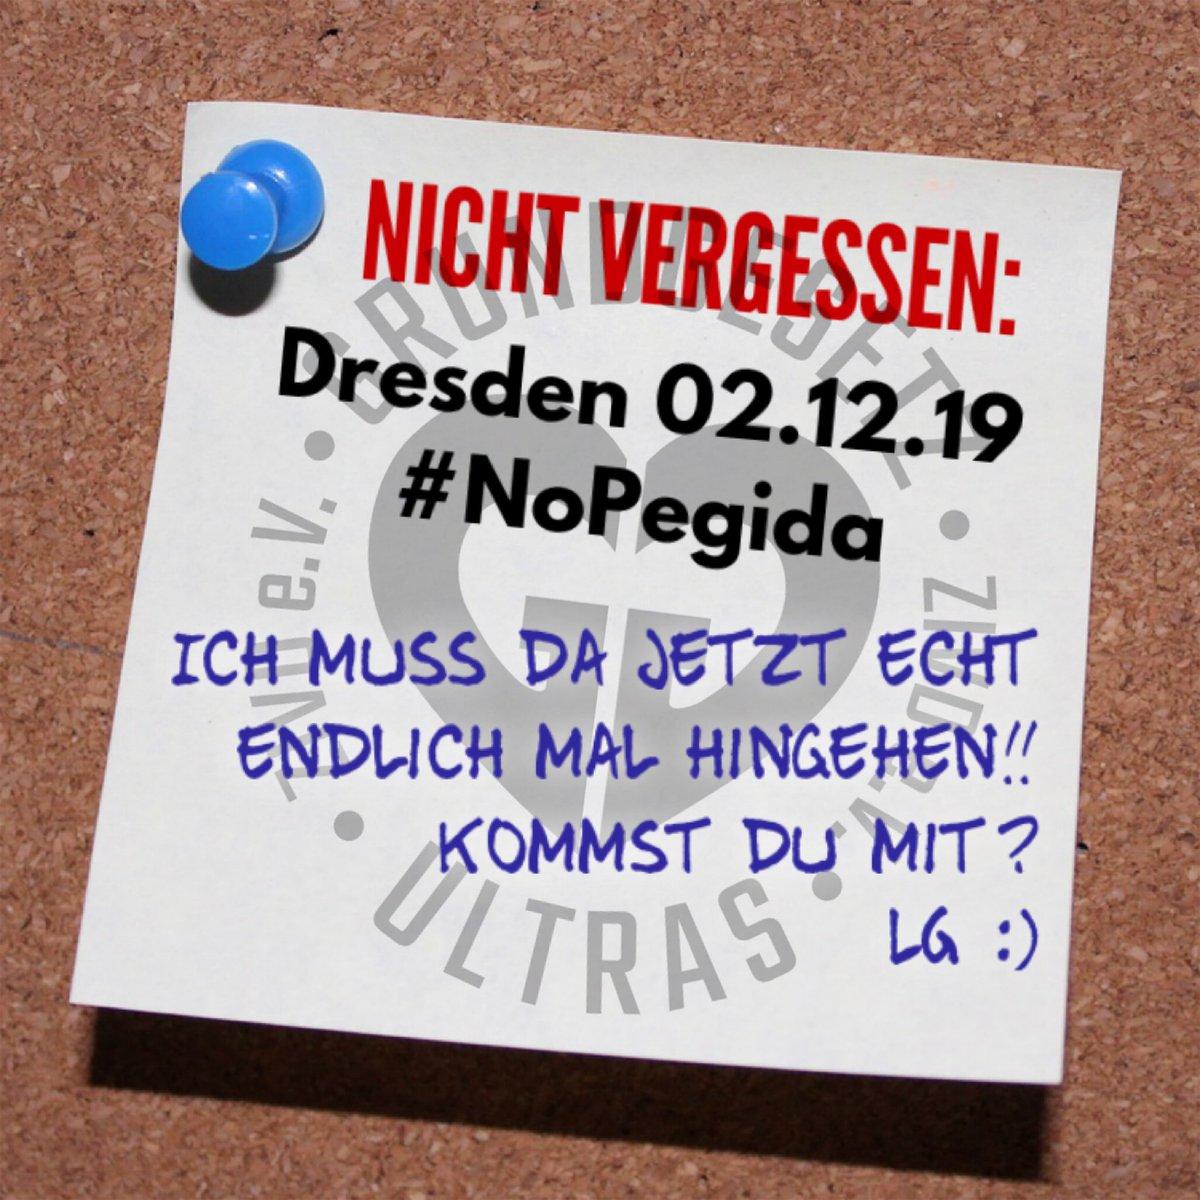 Save the date: 02.12.19  Dresden #Nopegida  #DresdenGehtUnsAlleAn #NaziNotstand #dd0212 #NopegidaDD #GGUltras  #HerzStattHetze #NazisRaus<br>http://pic.twitter.com/1ODqBoCiHF